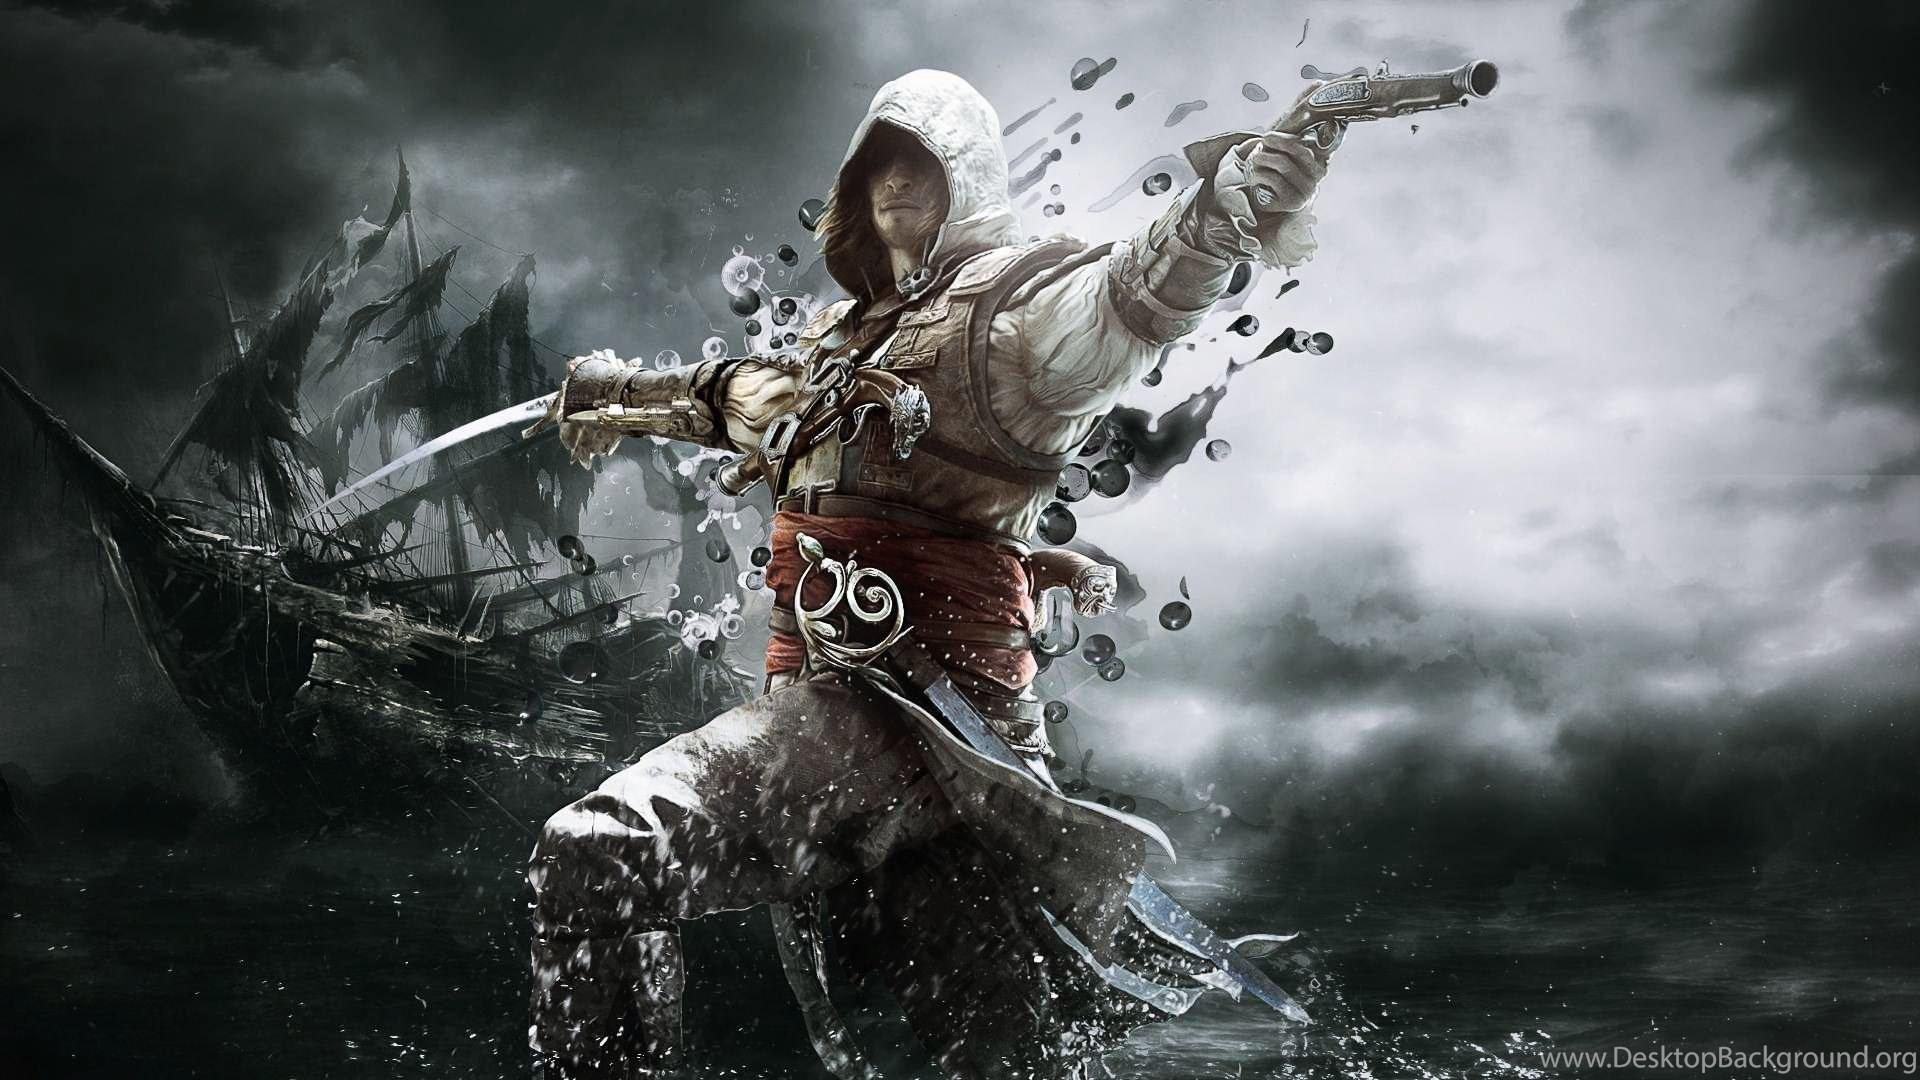 Assassins Creed Unity Hd Wallpaper 3 Jpg Desktop Background